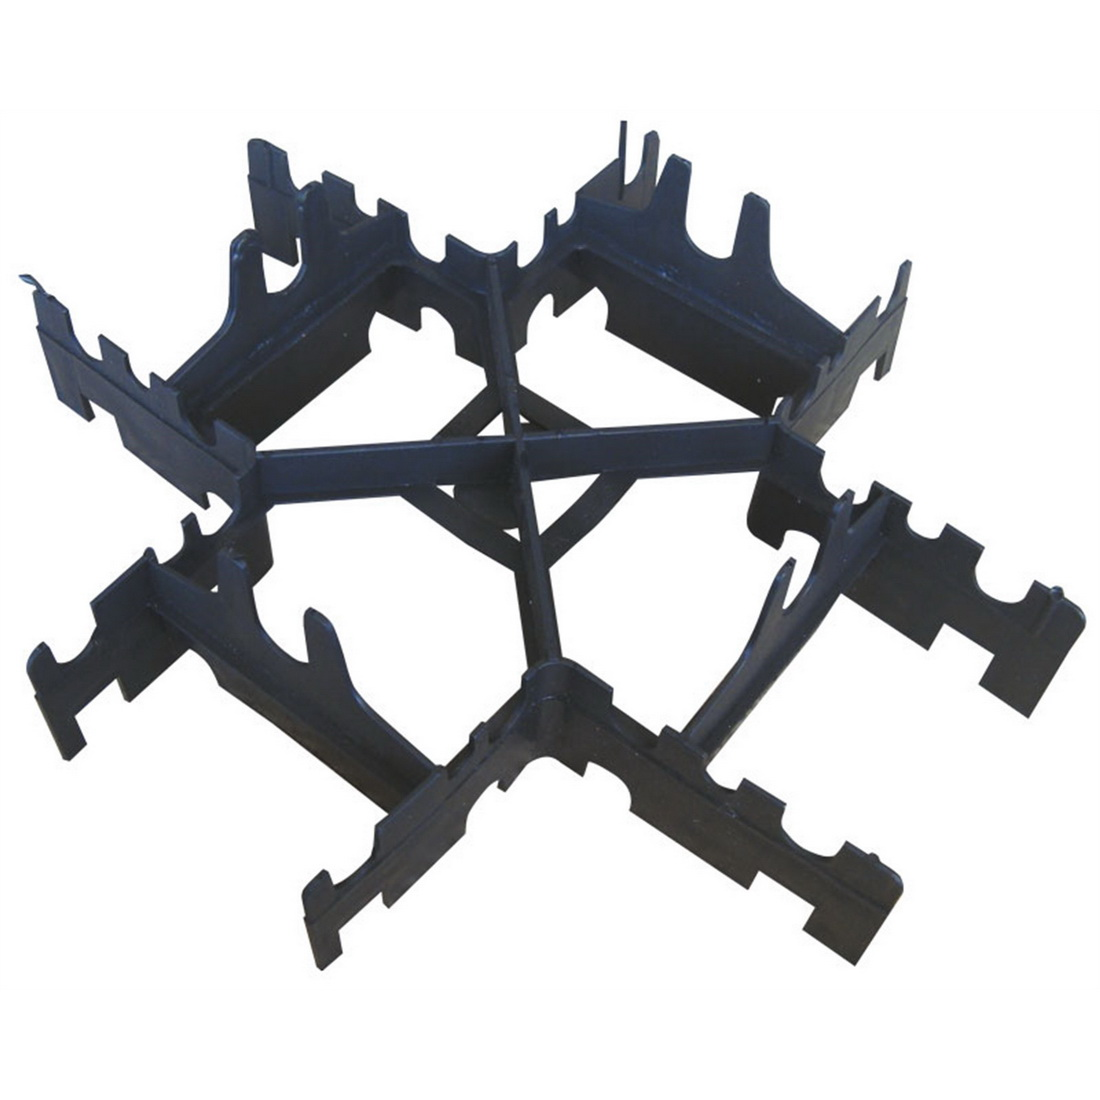 Expol Center Spacer 100 x 80 x 300mm Plastic Black SPACER100